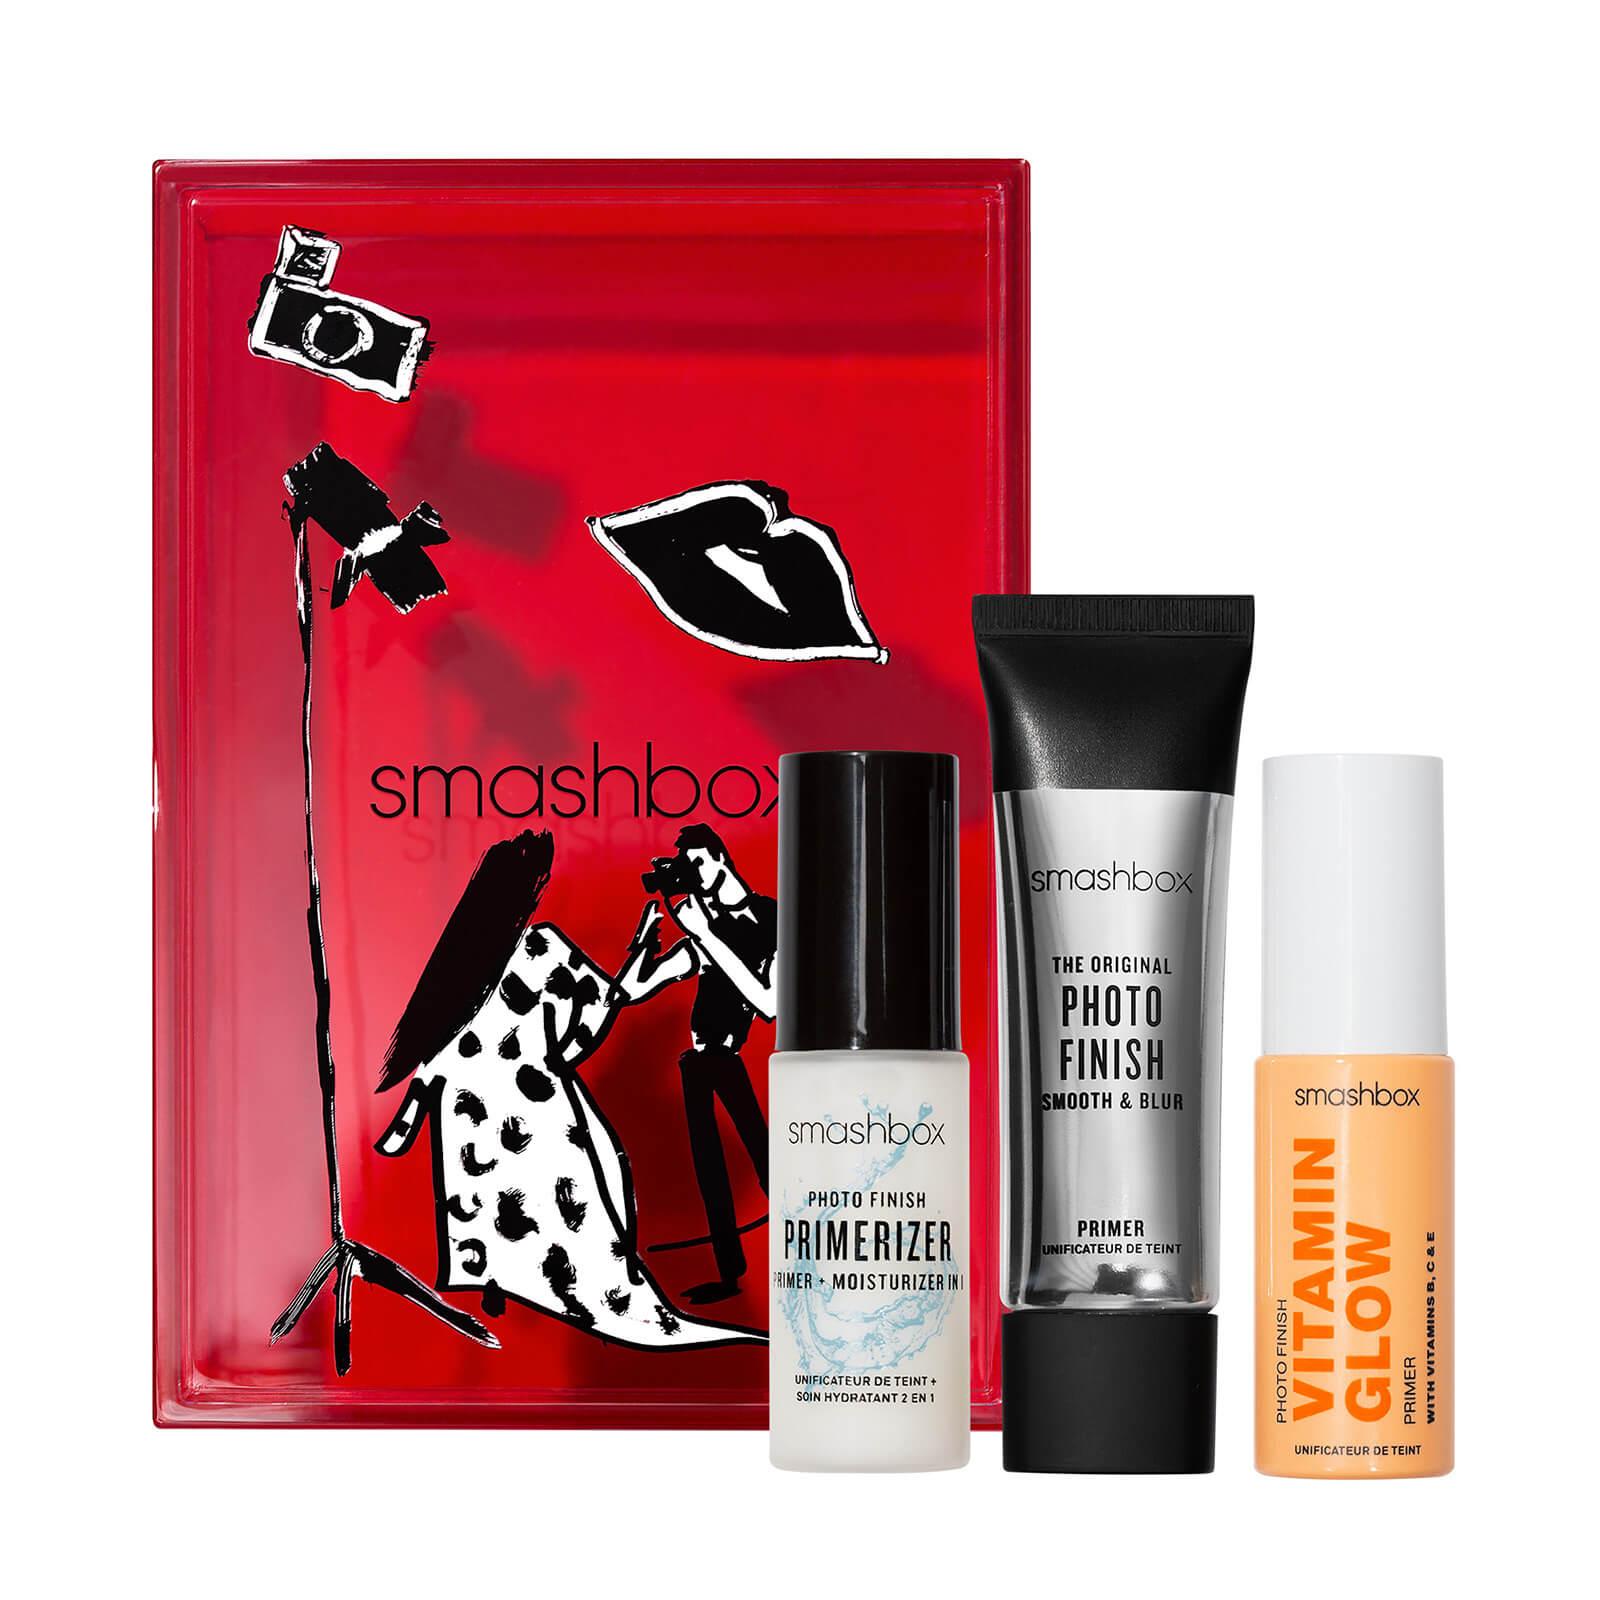 30% Off Christmas Gift Sets + Free Delivery & Free Returns e.g. Smashbox Photo Finish Primer Trio now £21 delivered @ Smashbox